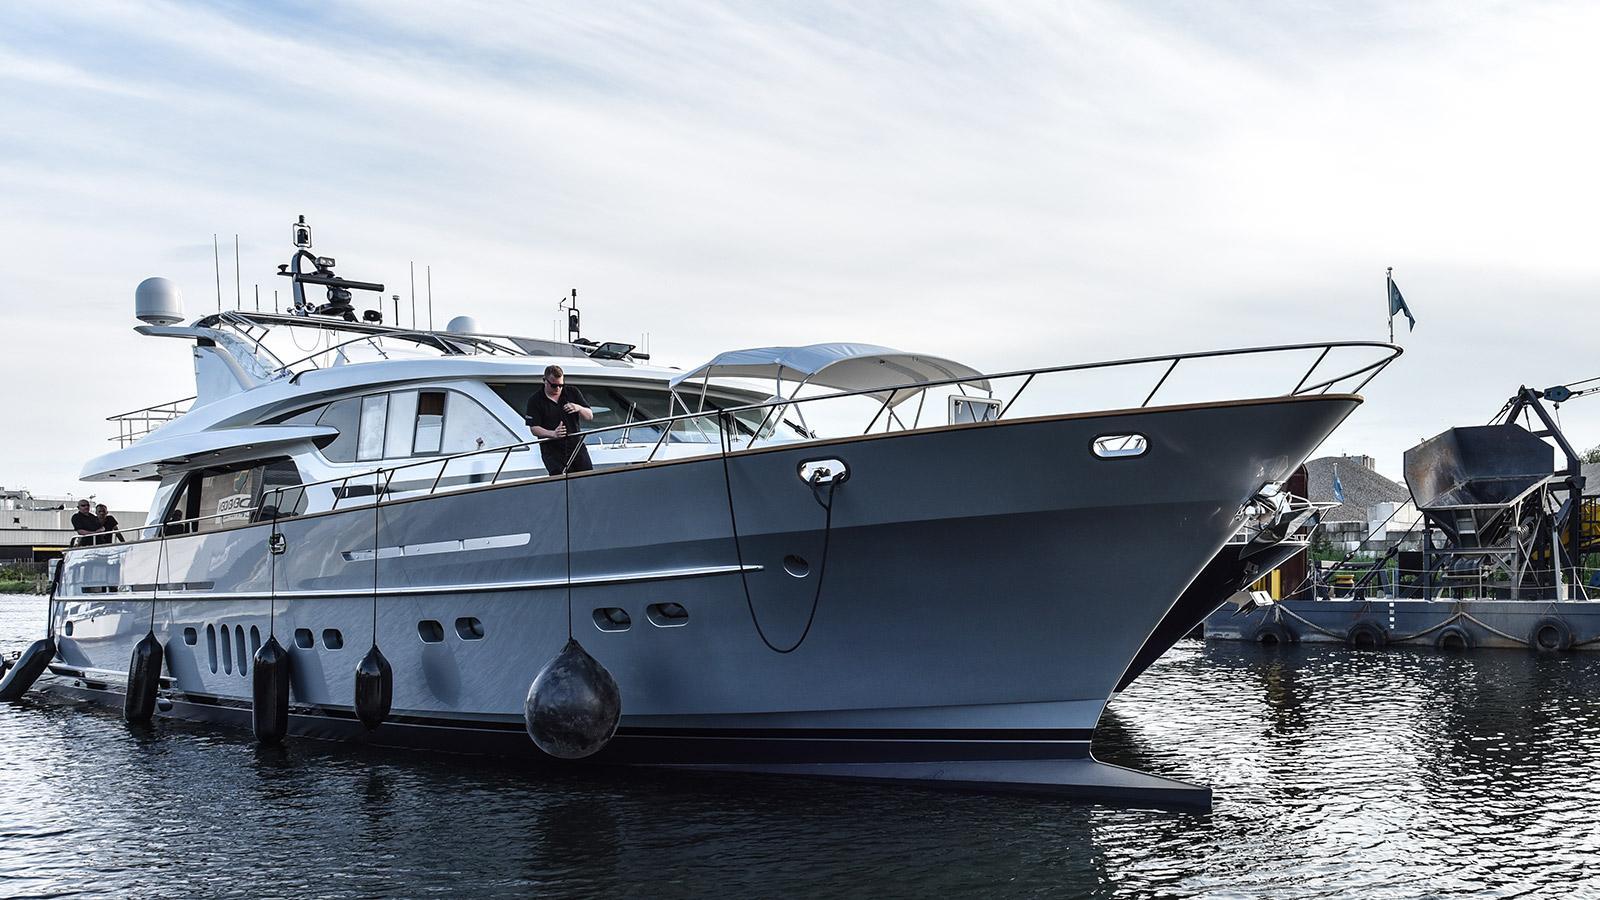 anemeli motoryacht van der valk continental two 2017 27m launch half profile